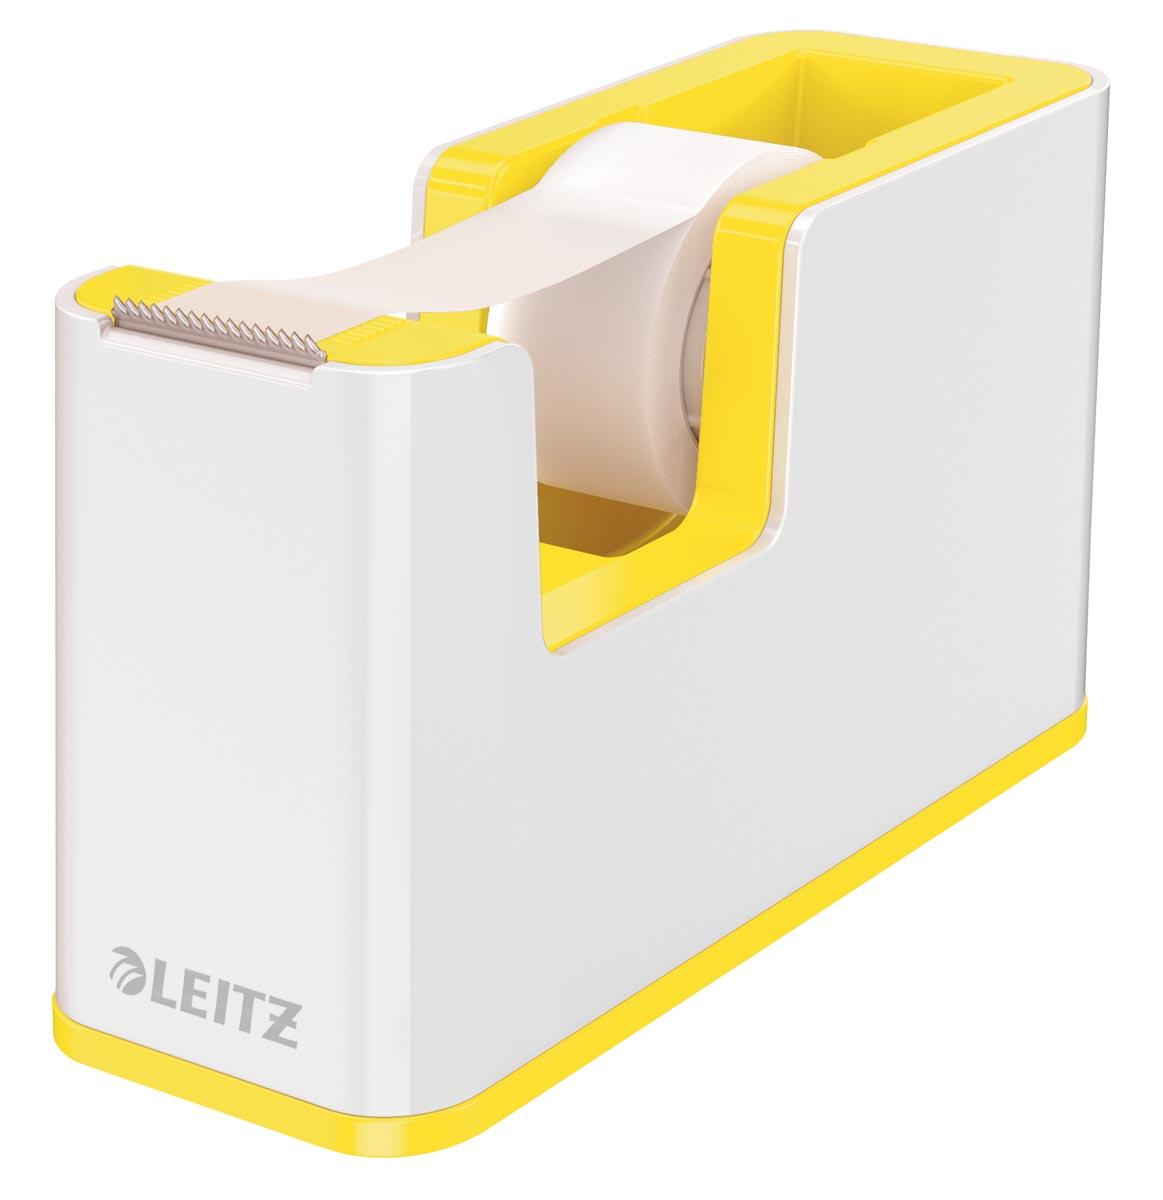 Leitz WOW plakbandafroller geel